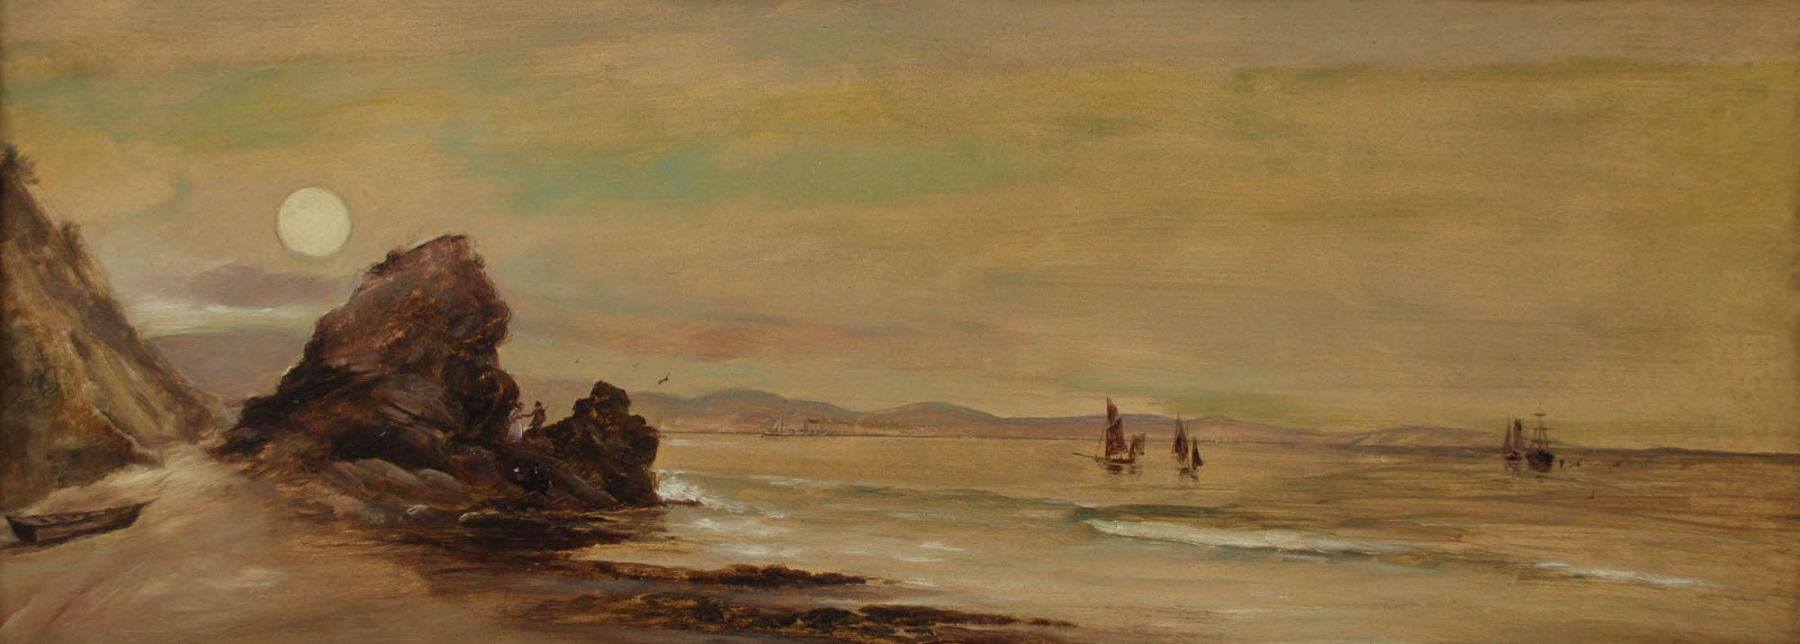 John Sykes, Moonrise at Castle Rock